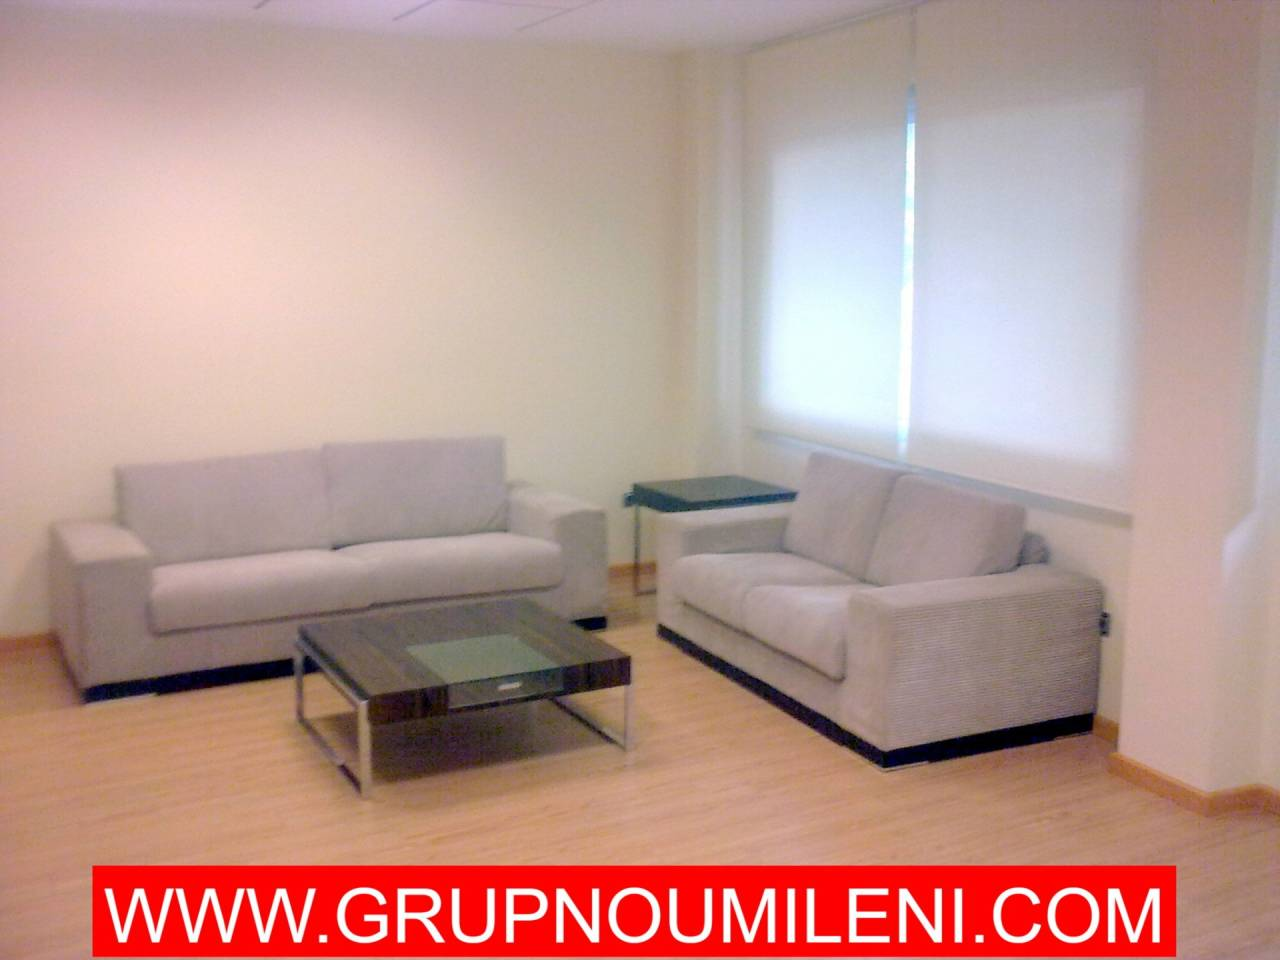 Alquiler Oficina  Calle calle cristóbal colón. Altura piso 1º, oficina superficie total 150 m², superficie útil